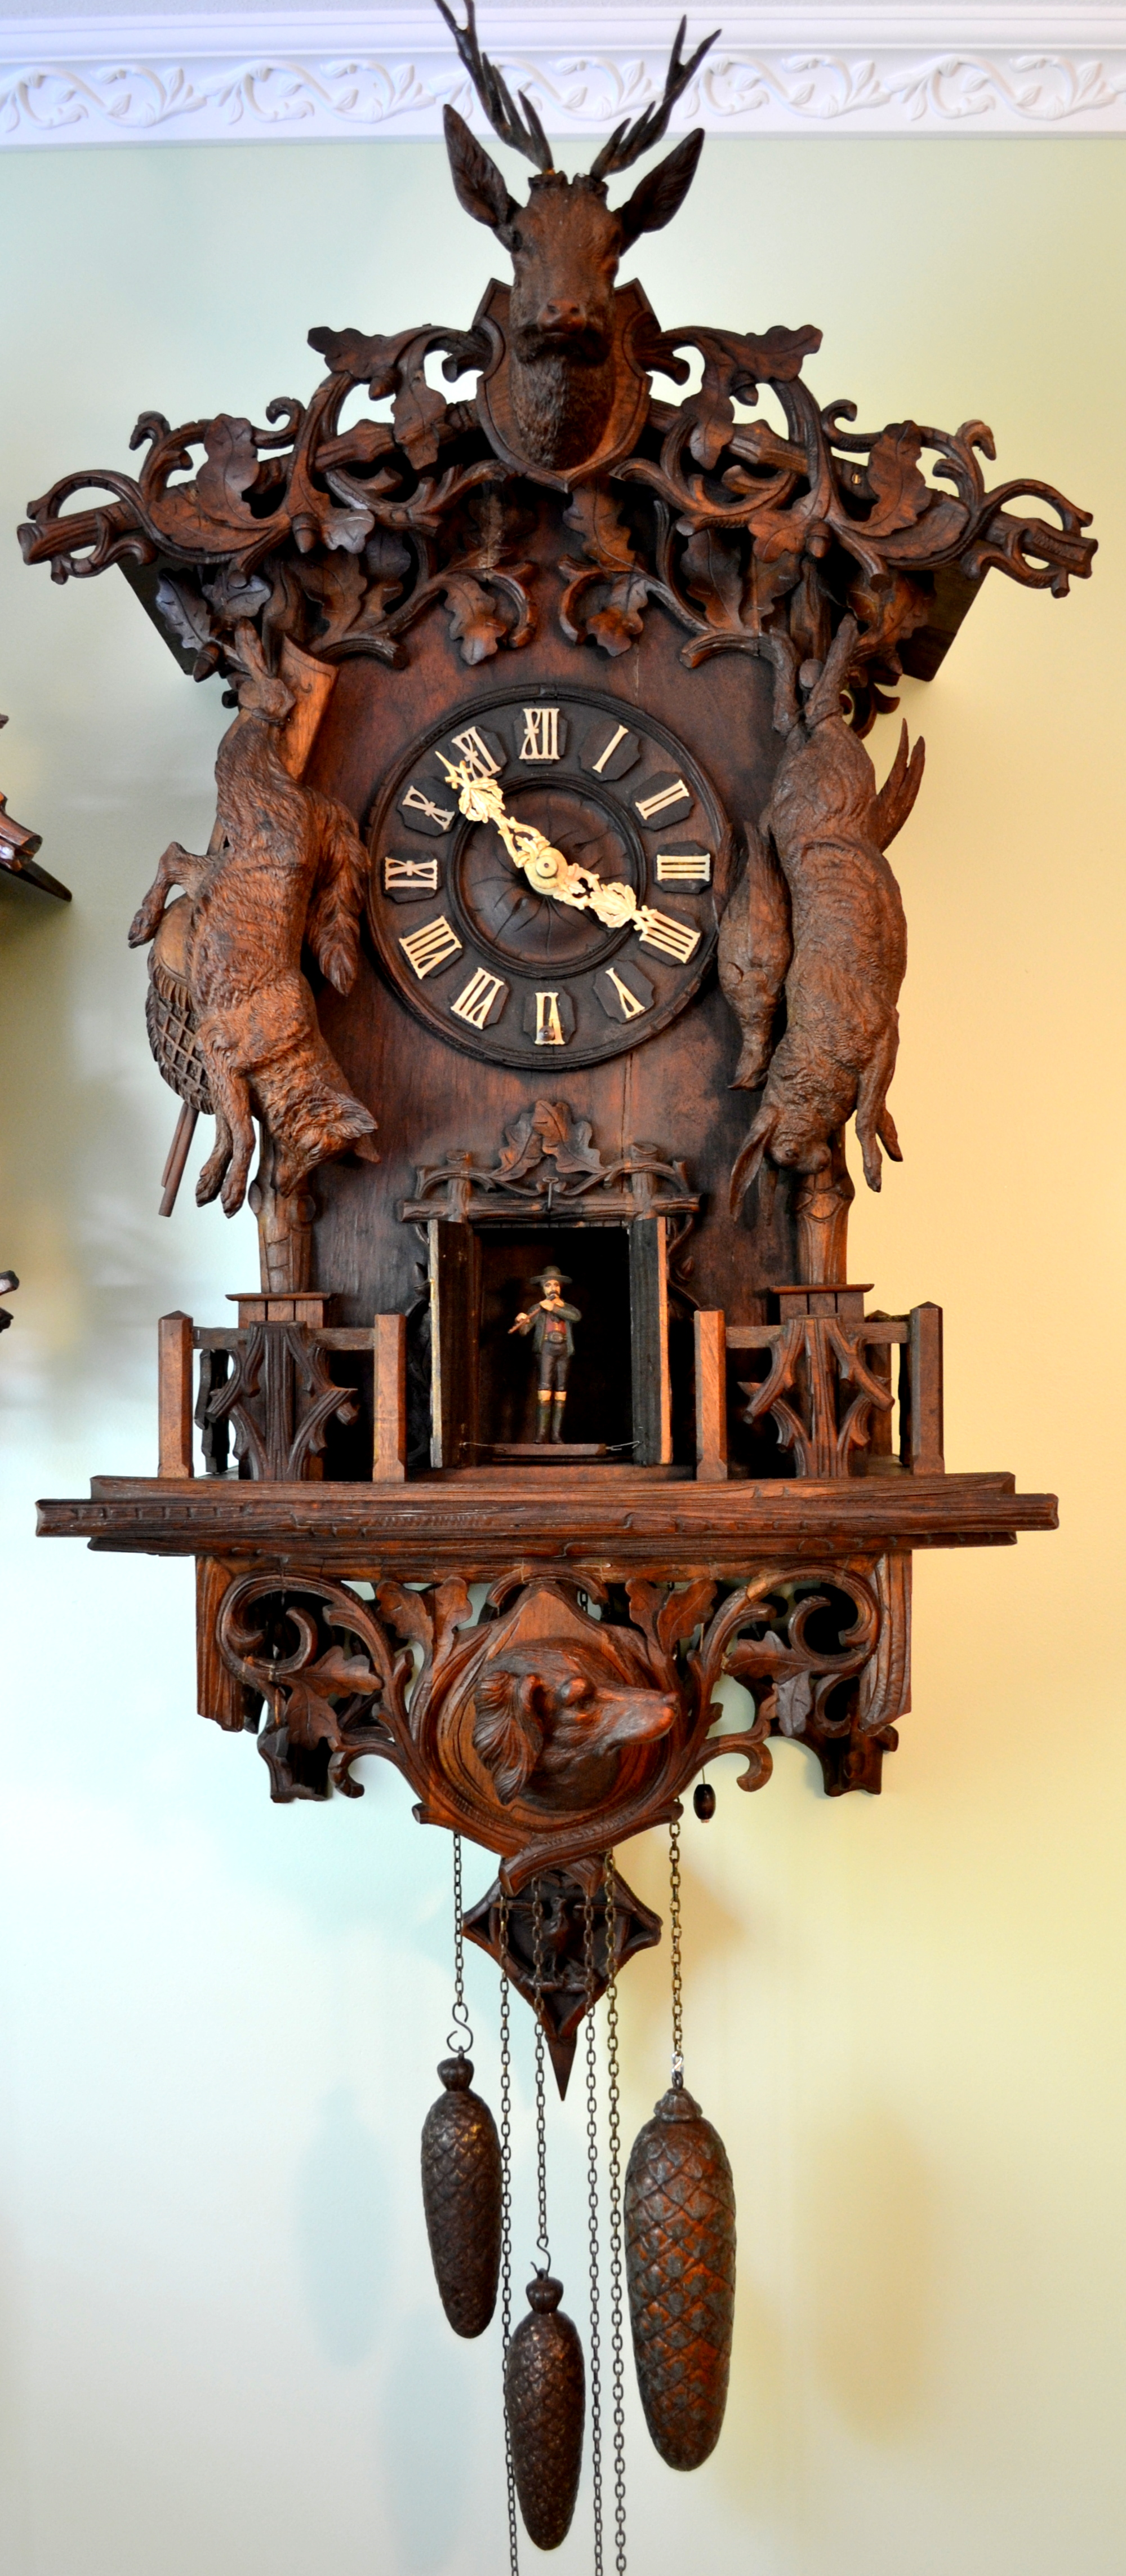 Wehrle eight pipe flute clock